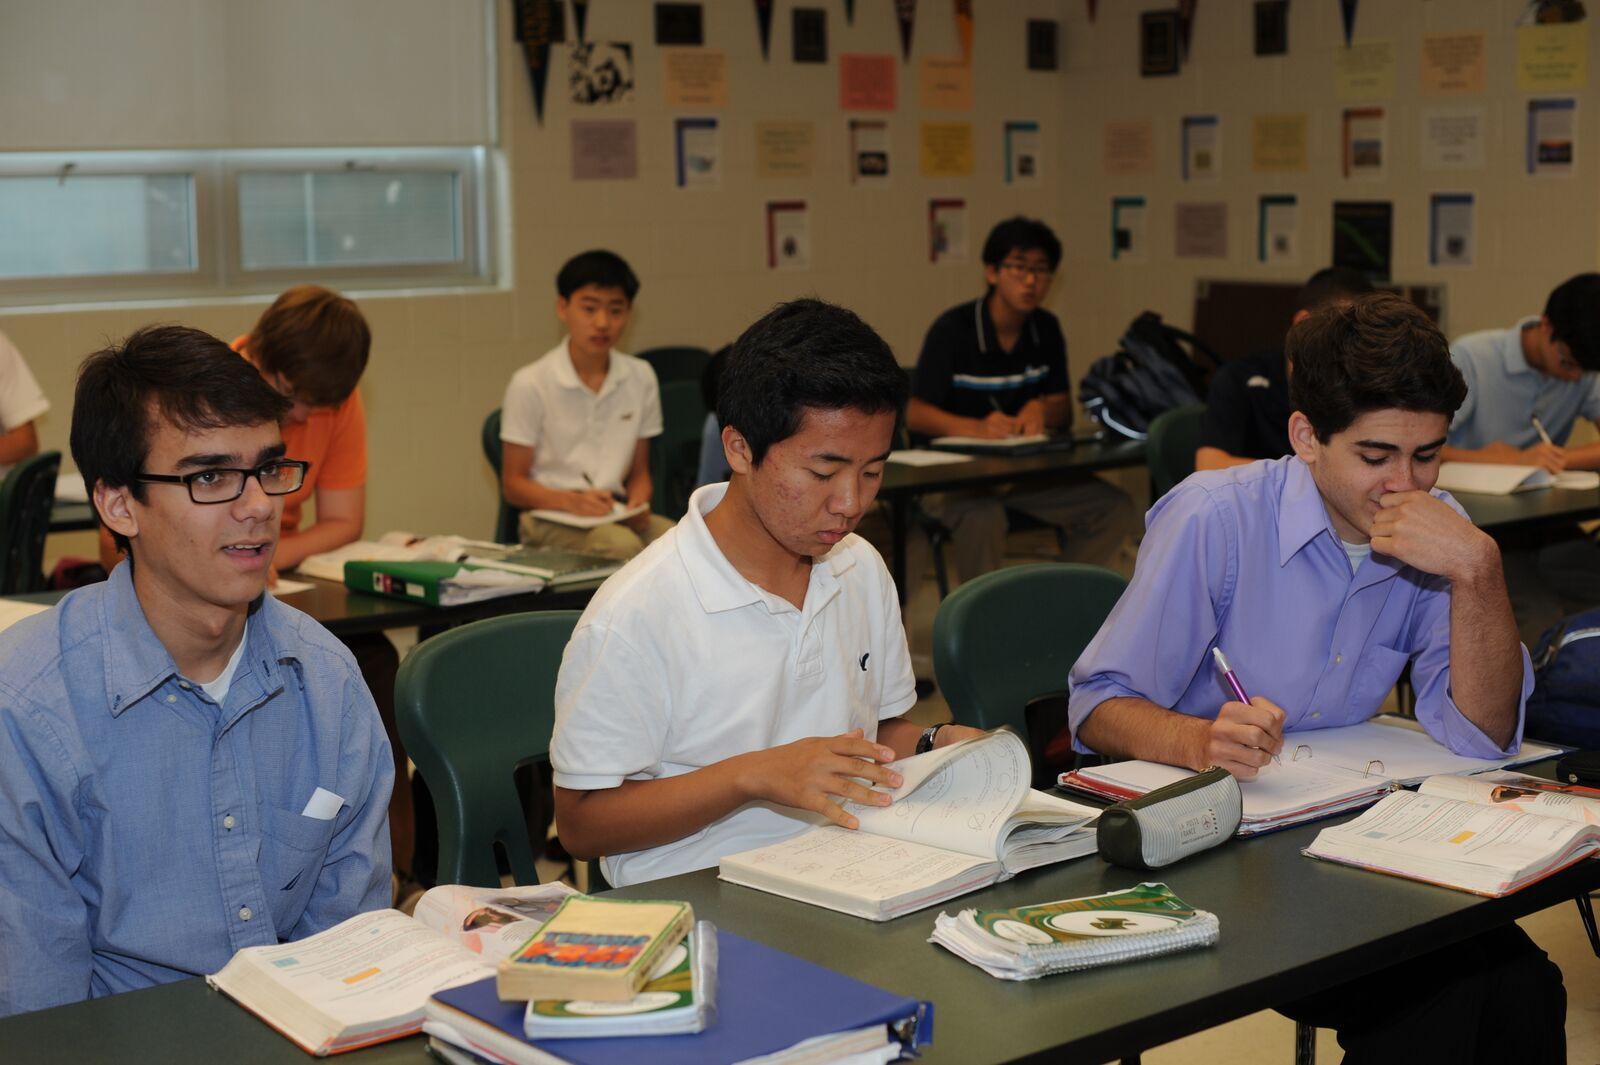 BHHS - Classroom 2.jpg